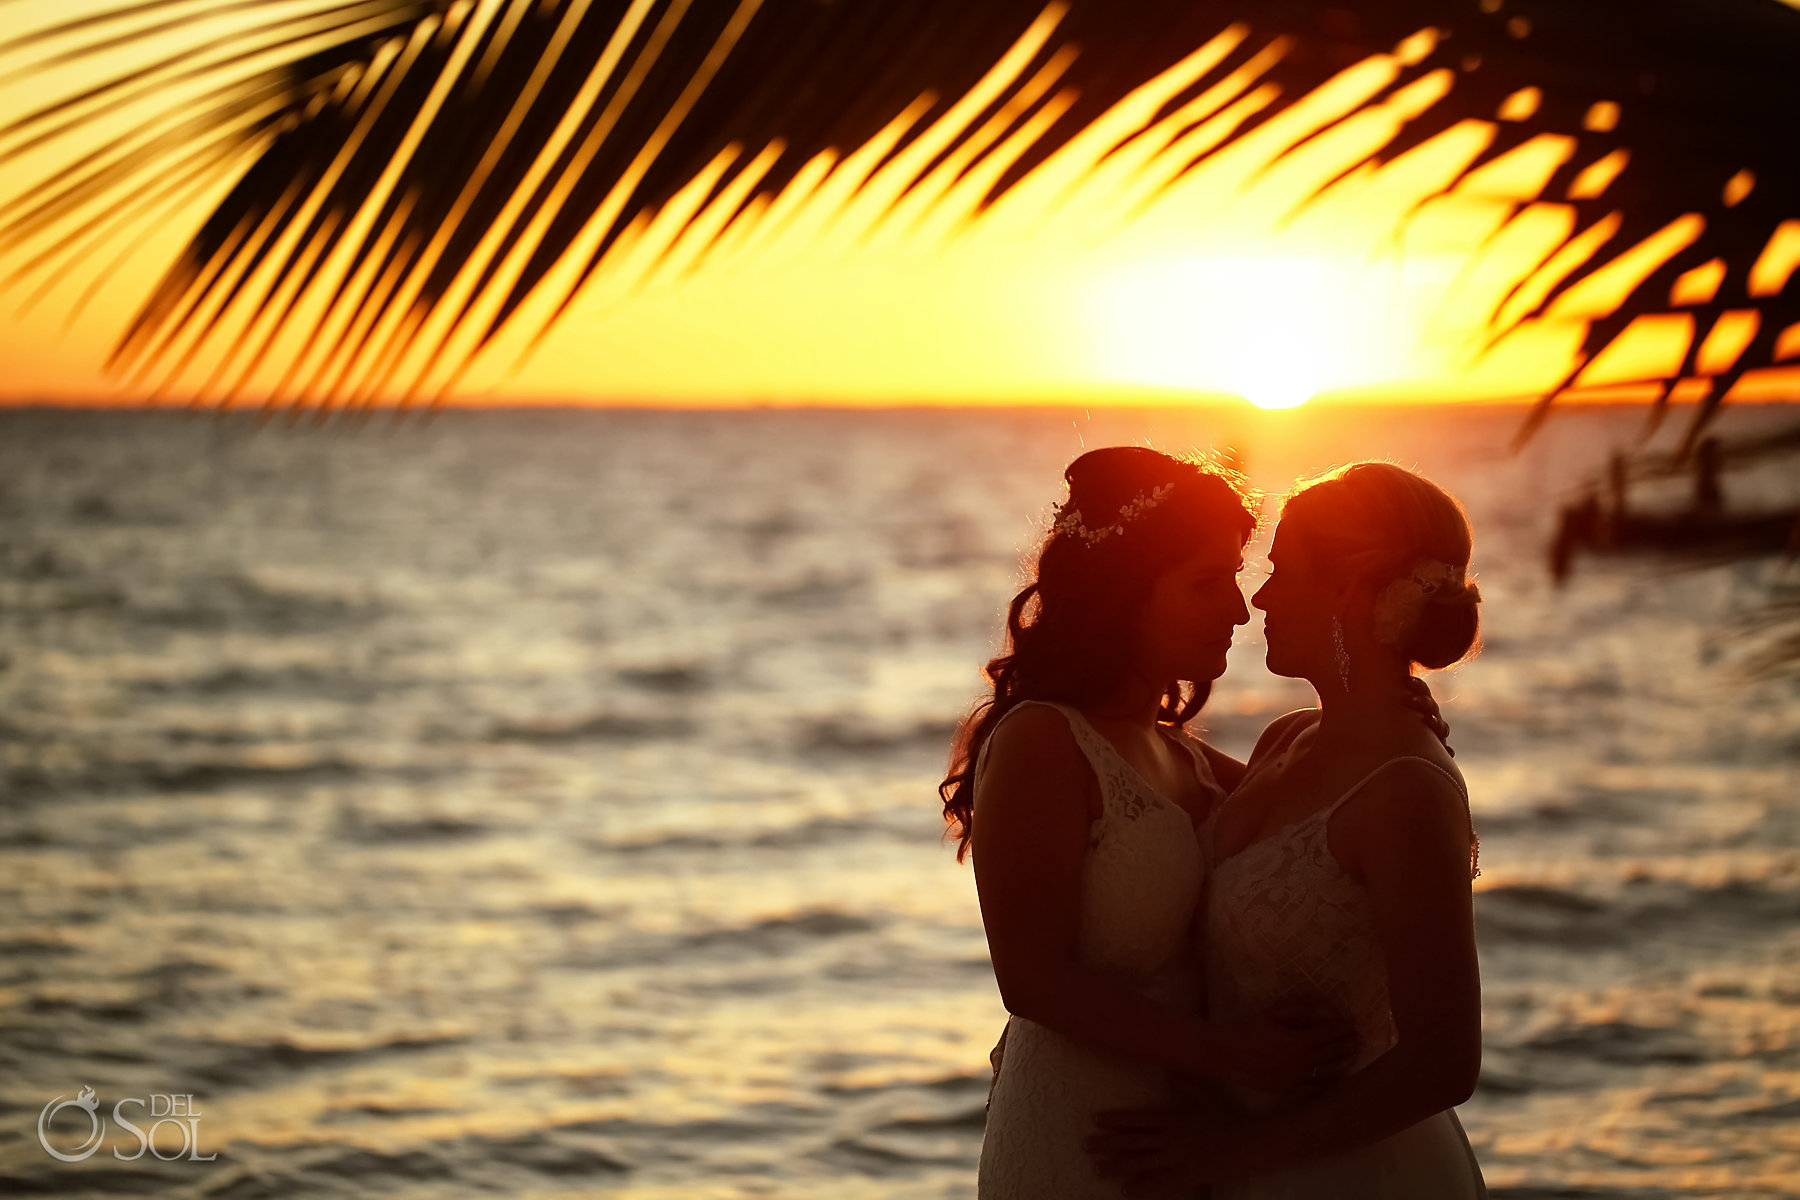 Warm Caribbean Sunset Queer lesbian wedding photo session Isla Mujeres Zama Beach